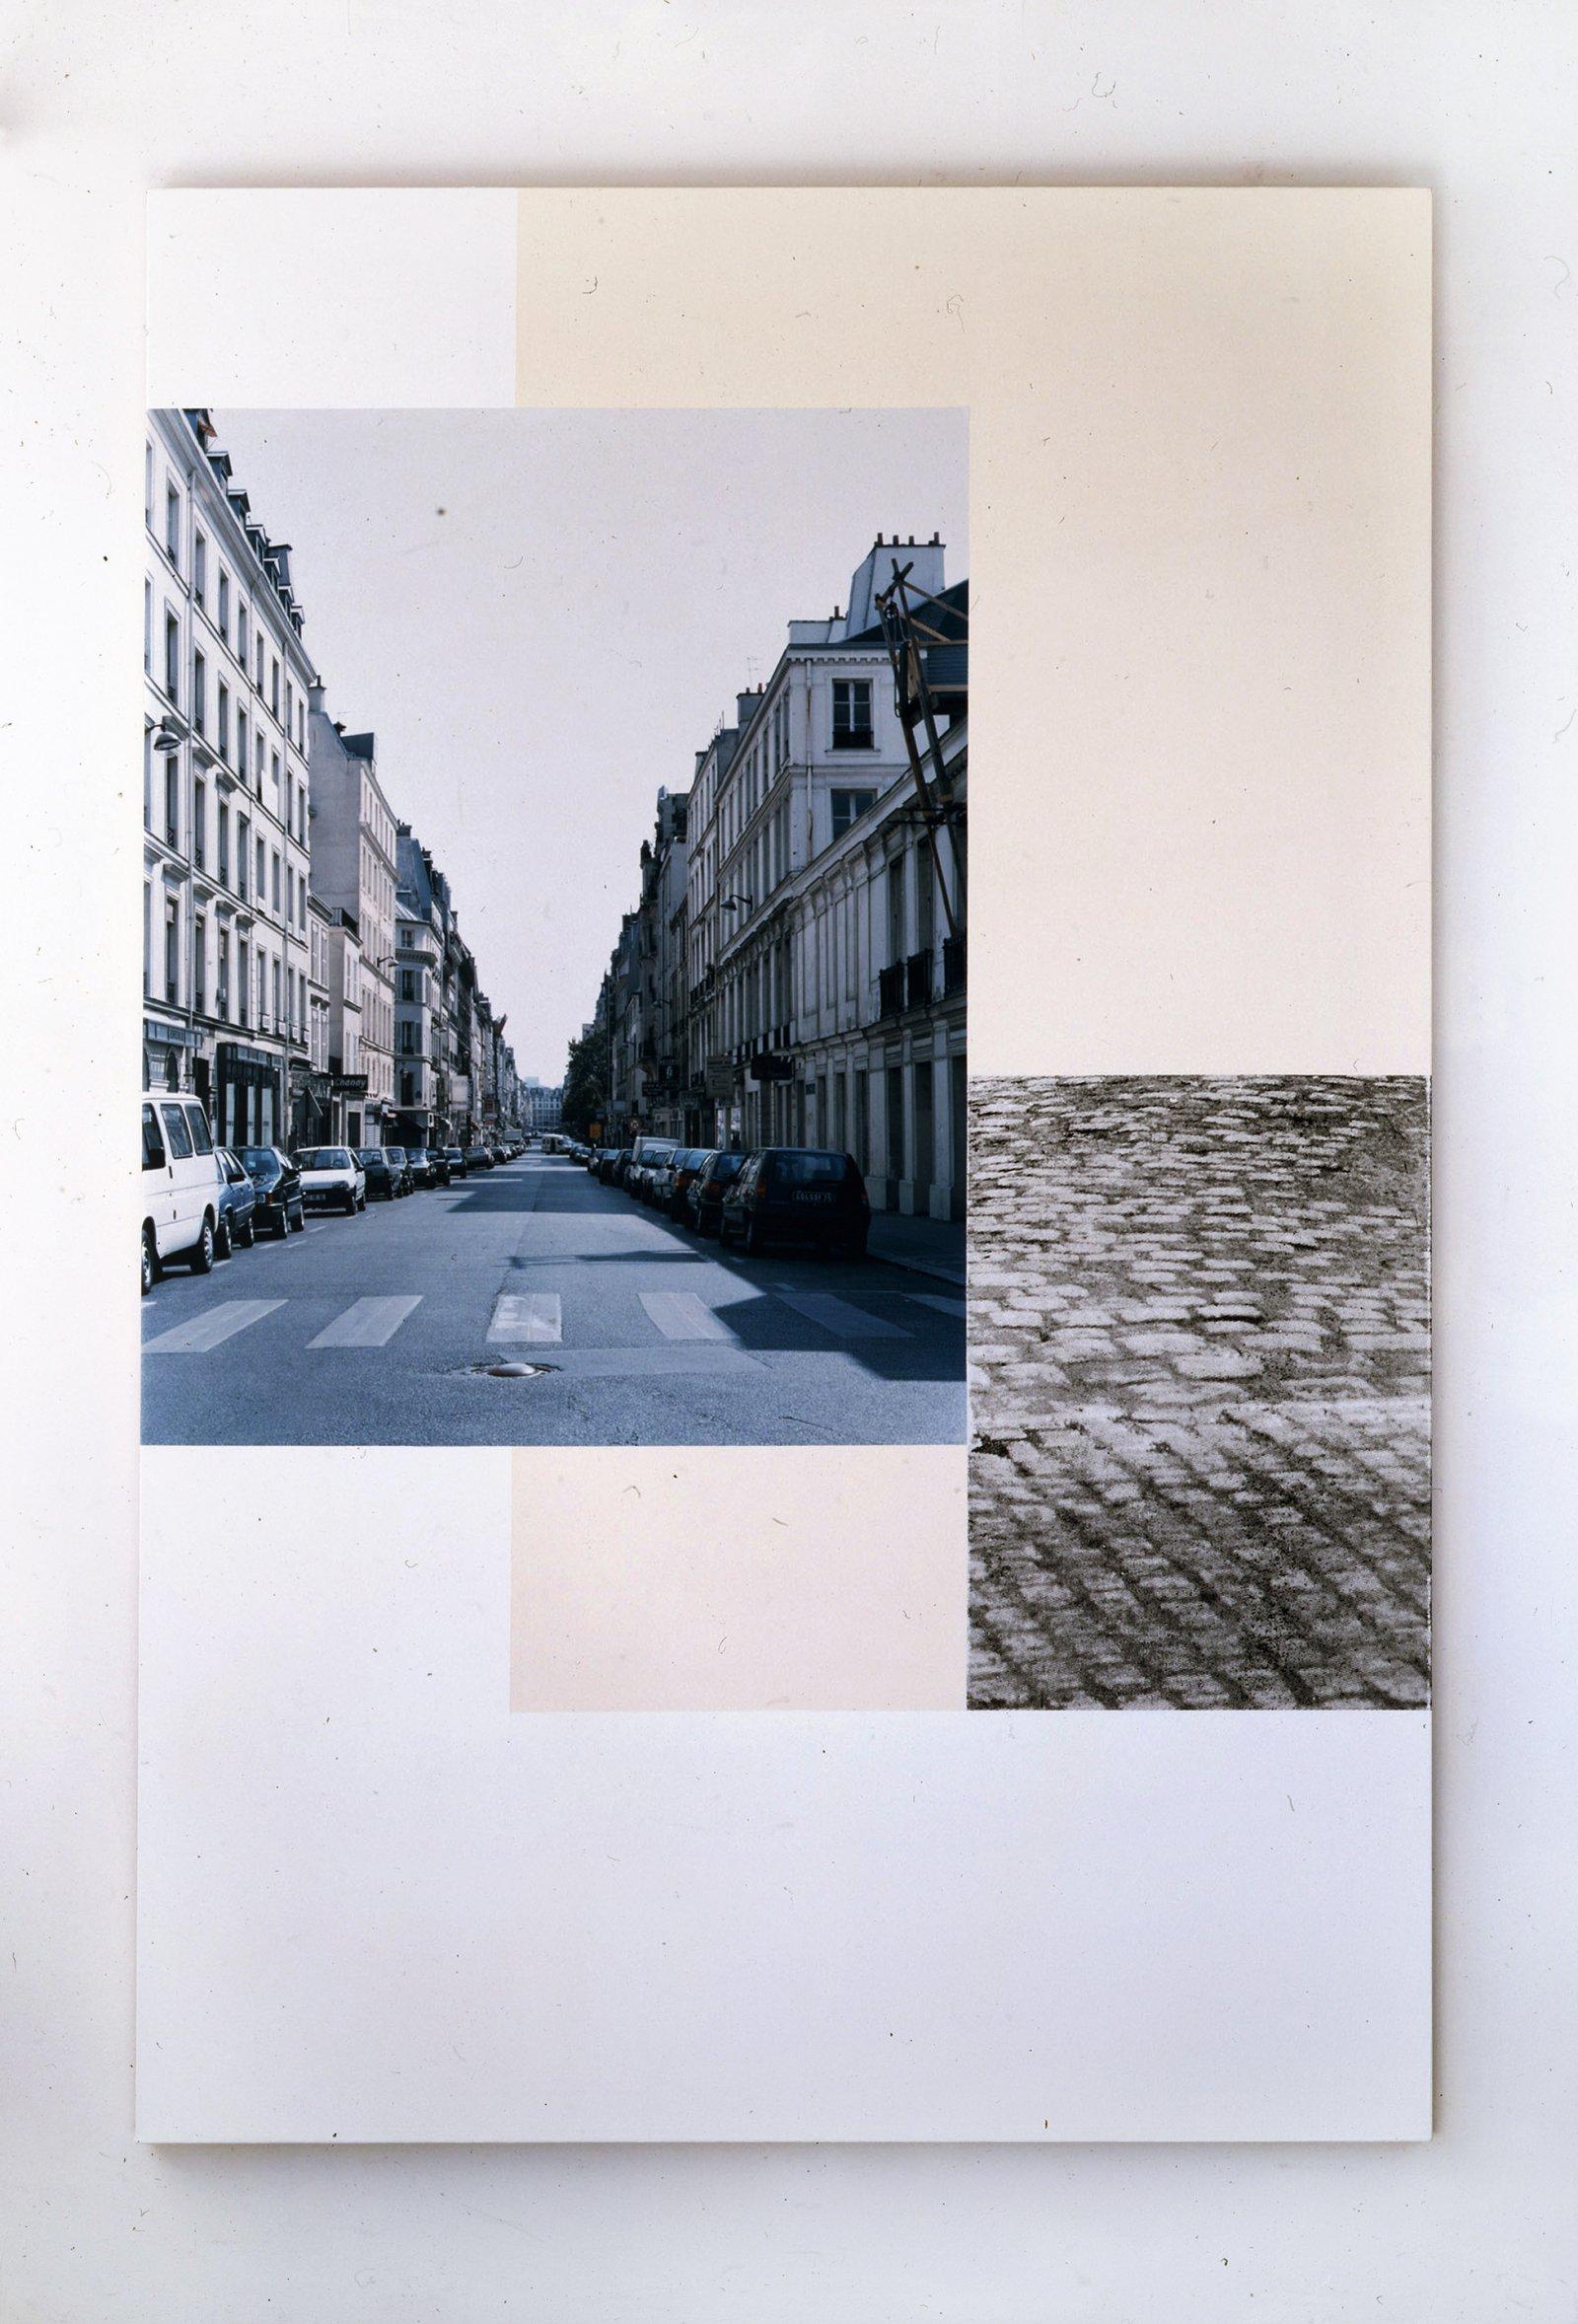 Ian Wallace, Rue Turenne, Paris, 1997, photolaminate, acrylic and silkscreen on canvas, 90 x 60 in. (229 x 152 cm)